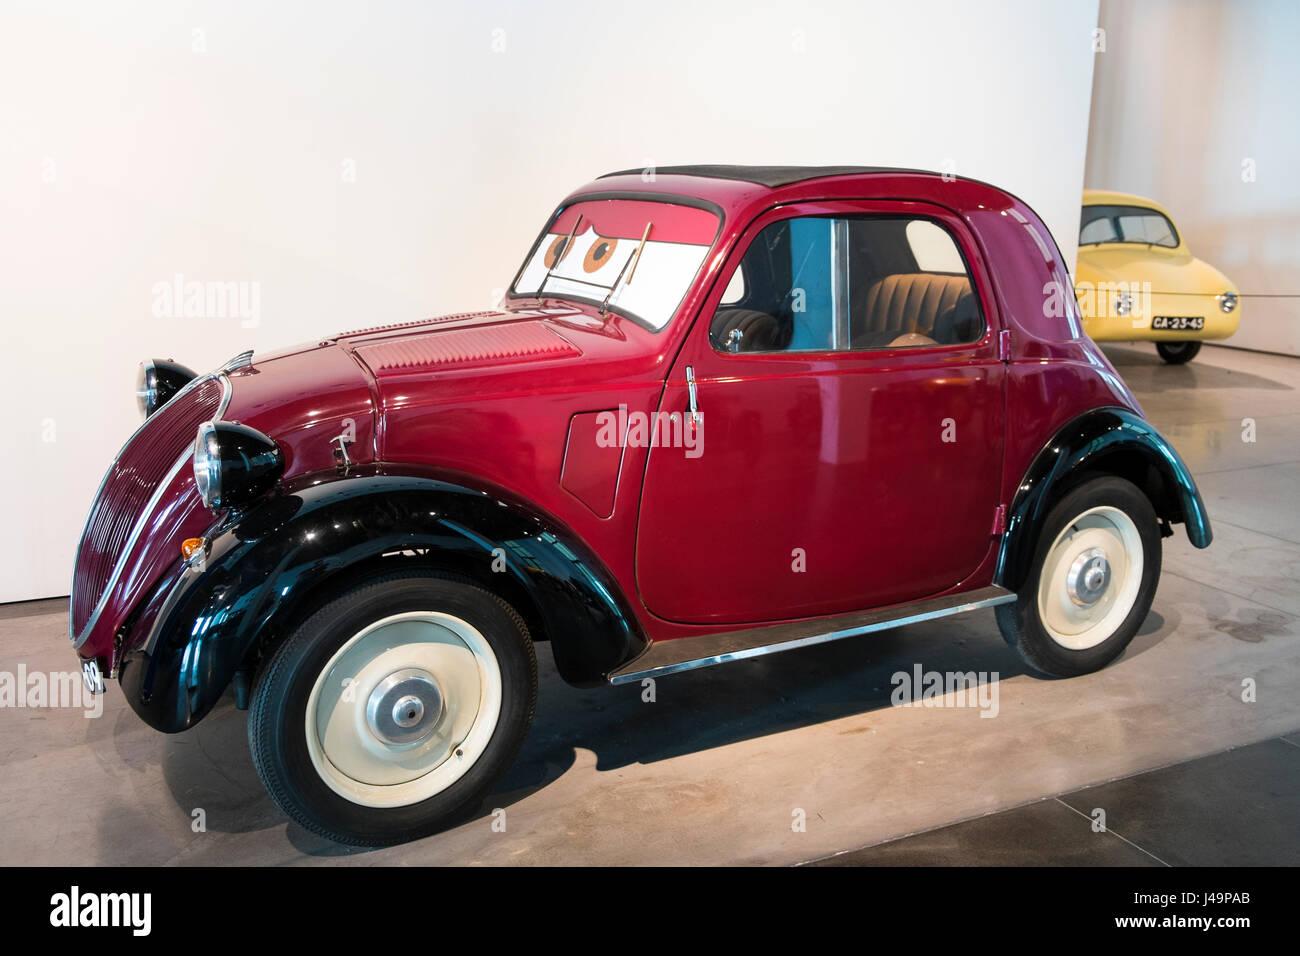 1936 Fiat 500 'Topolino'. Automobile museum of Málaga. Andalusia, Spain. - Stock Image